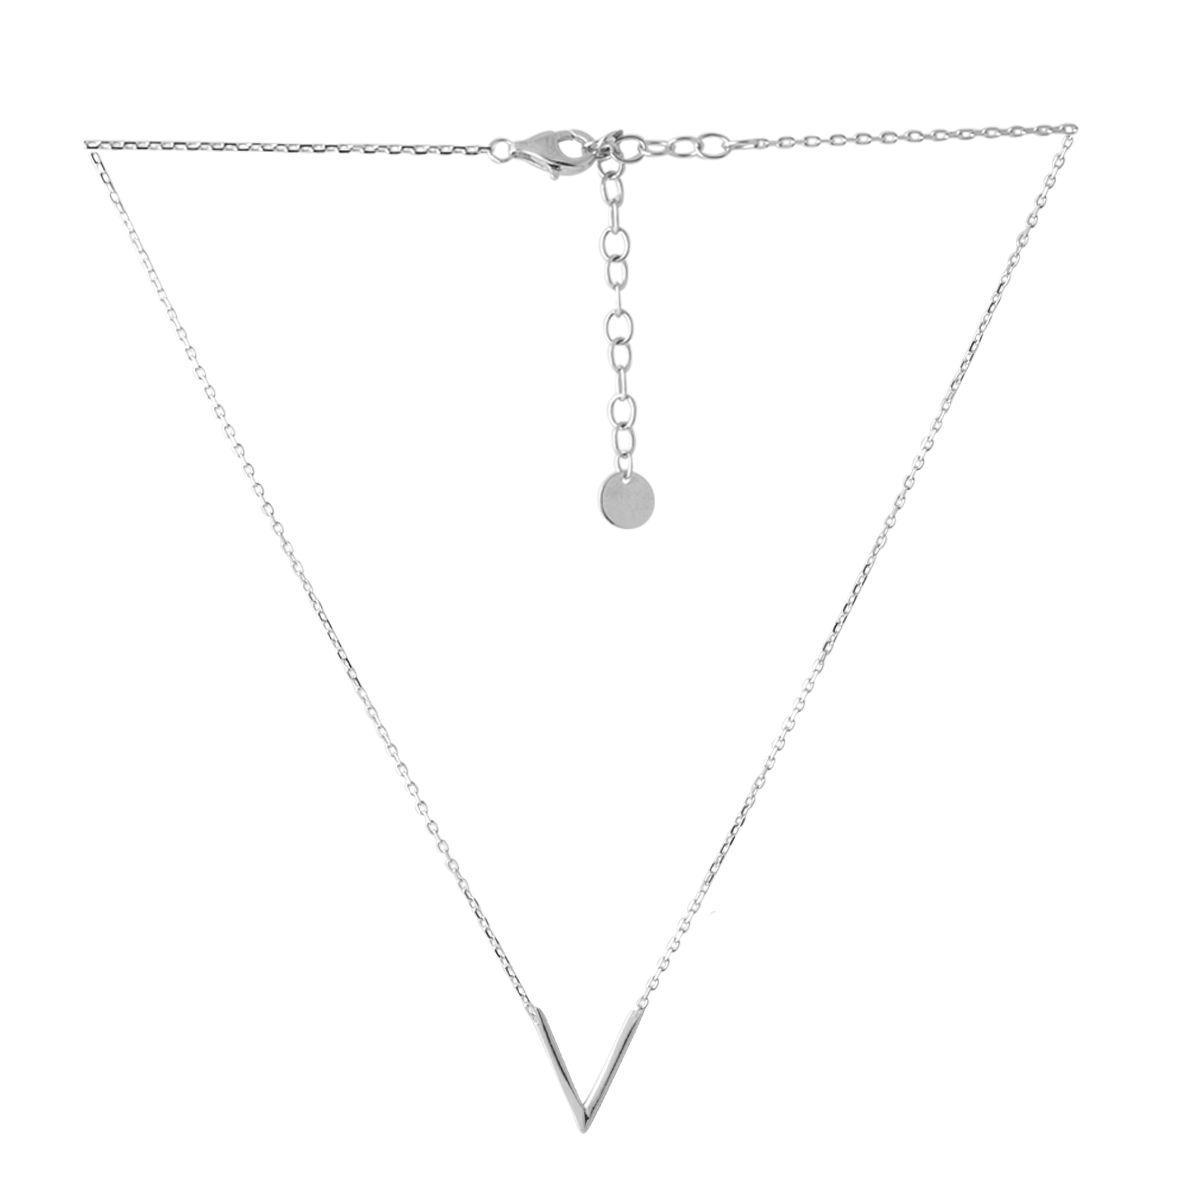 Серебряное колье DreamJewelry без камней (2052739) 440 размер